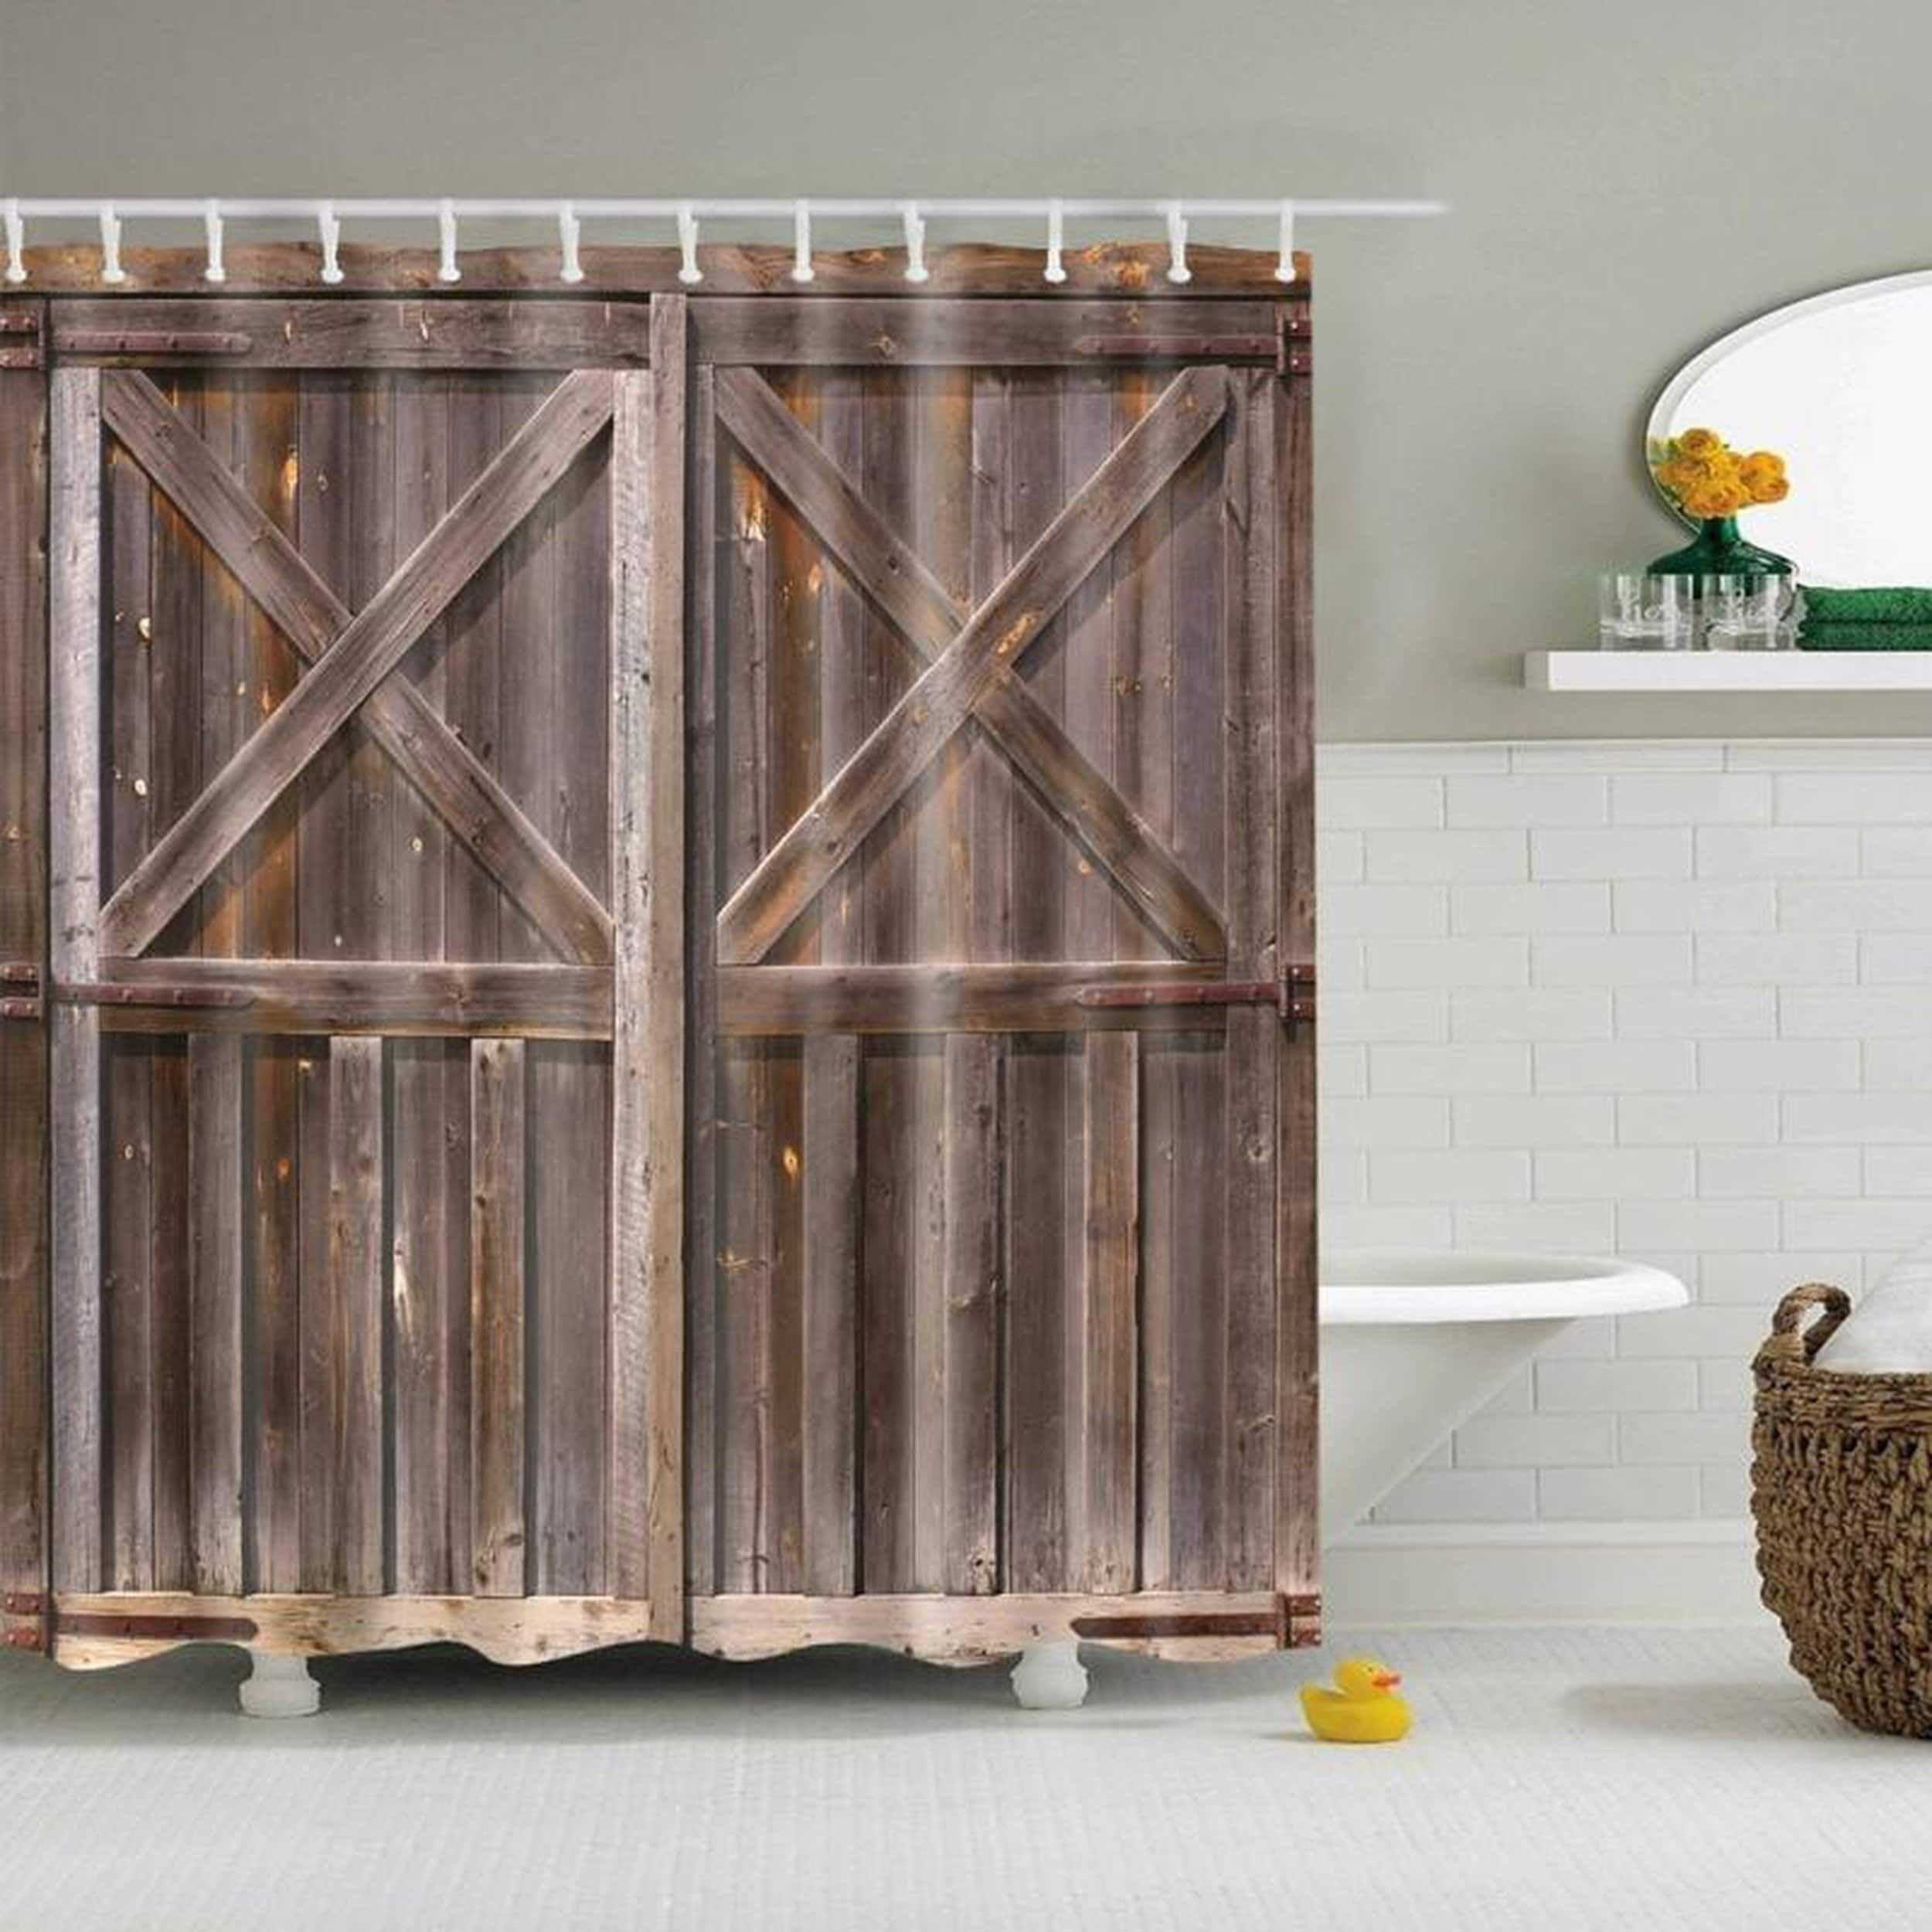 Rustic Wooden Barn Door Bathroom Waterproof Shower Curtain Set Fabric /& 12 Hooks